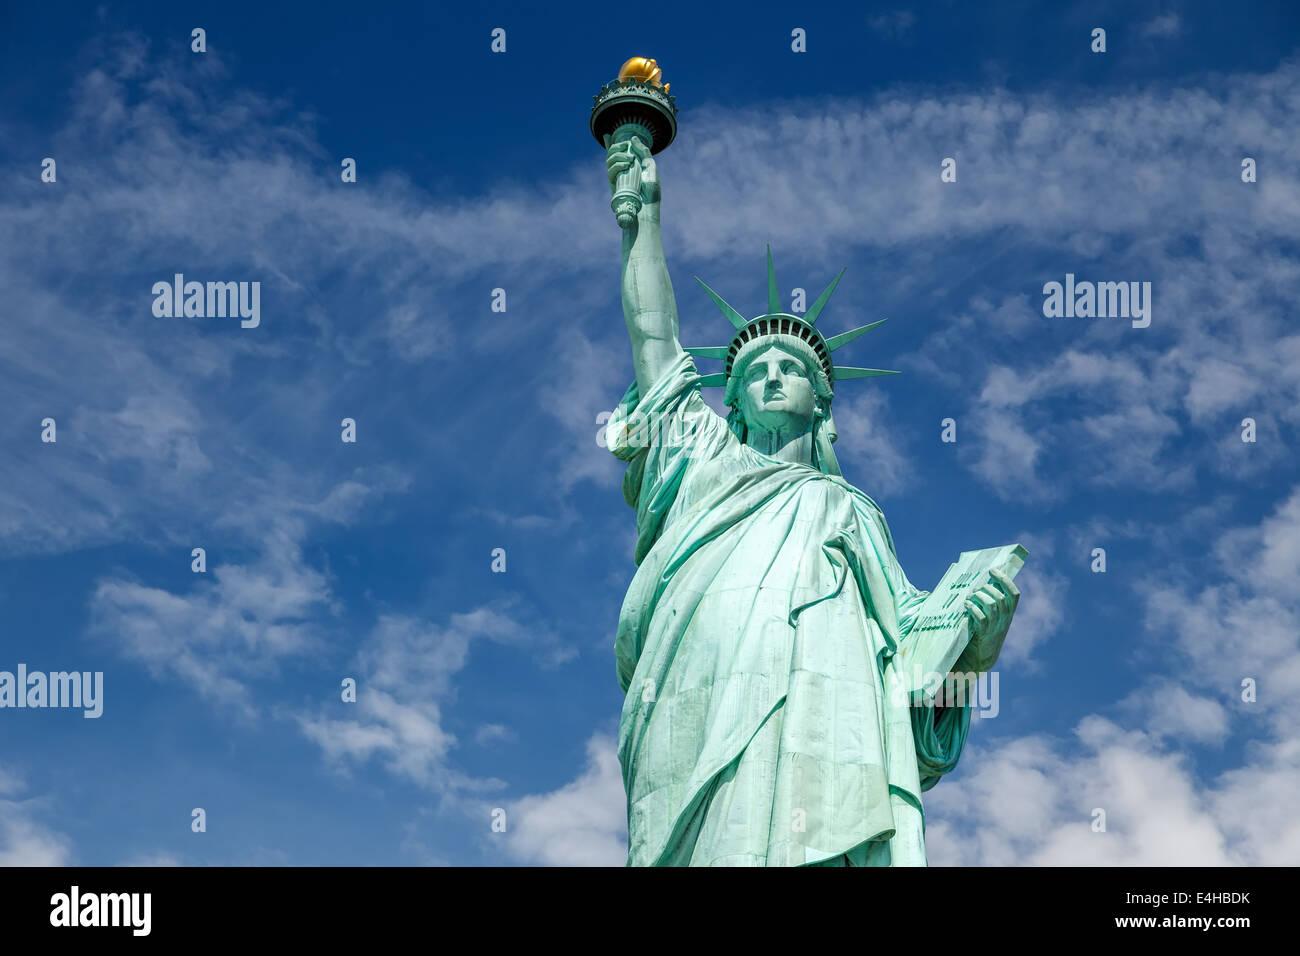 Statue of Liberty Stockfoto